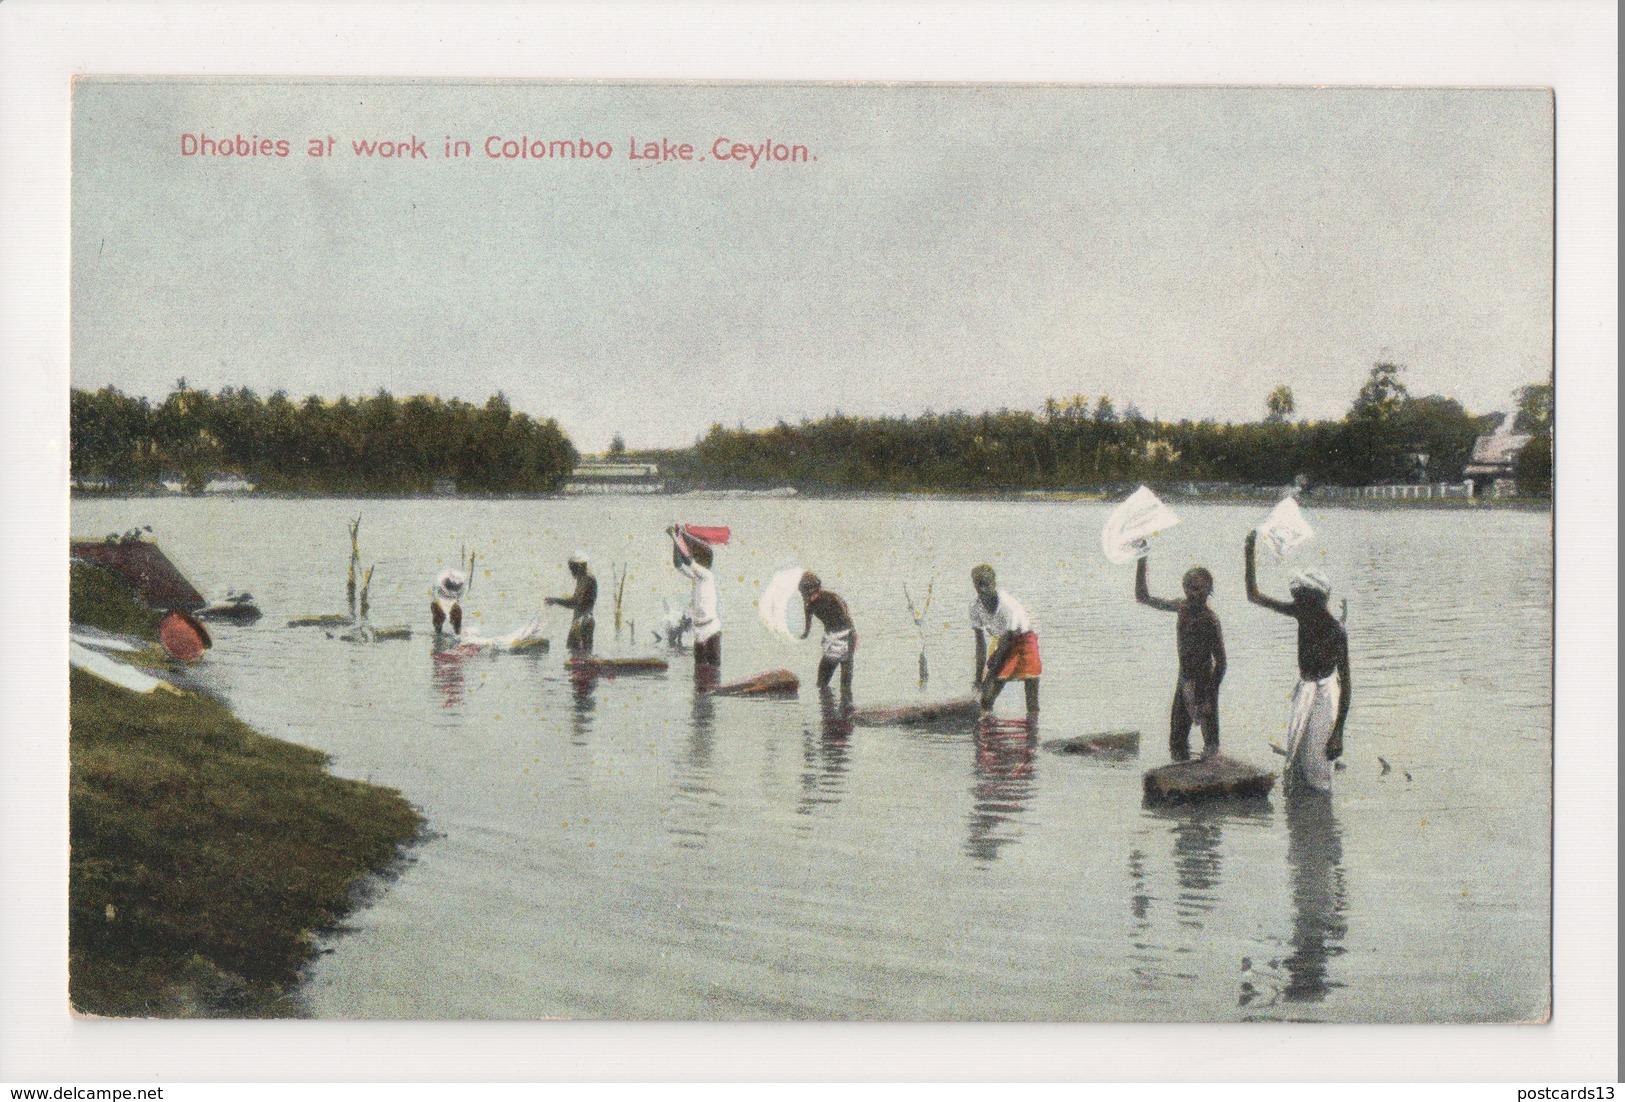 K-357 Ceylon Colombo Lake Sri Lanka Dhobies At Work Vintage Postcard - Other